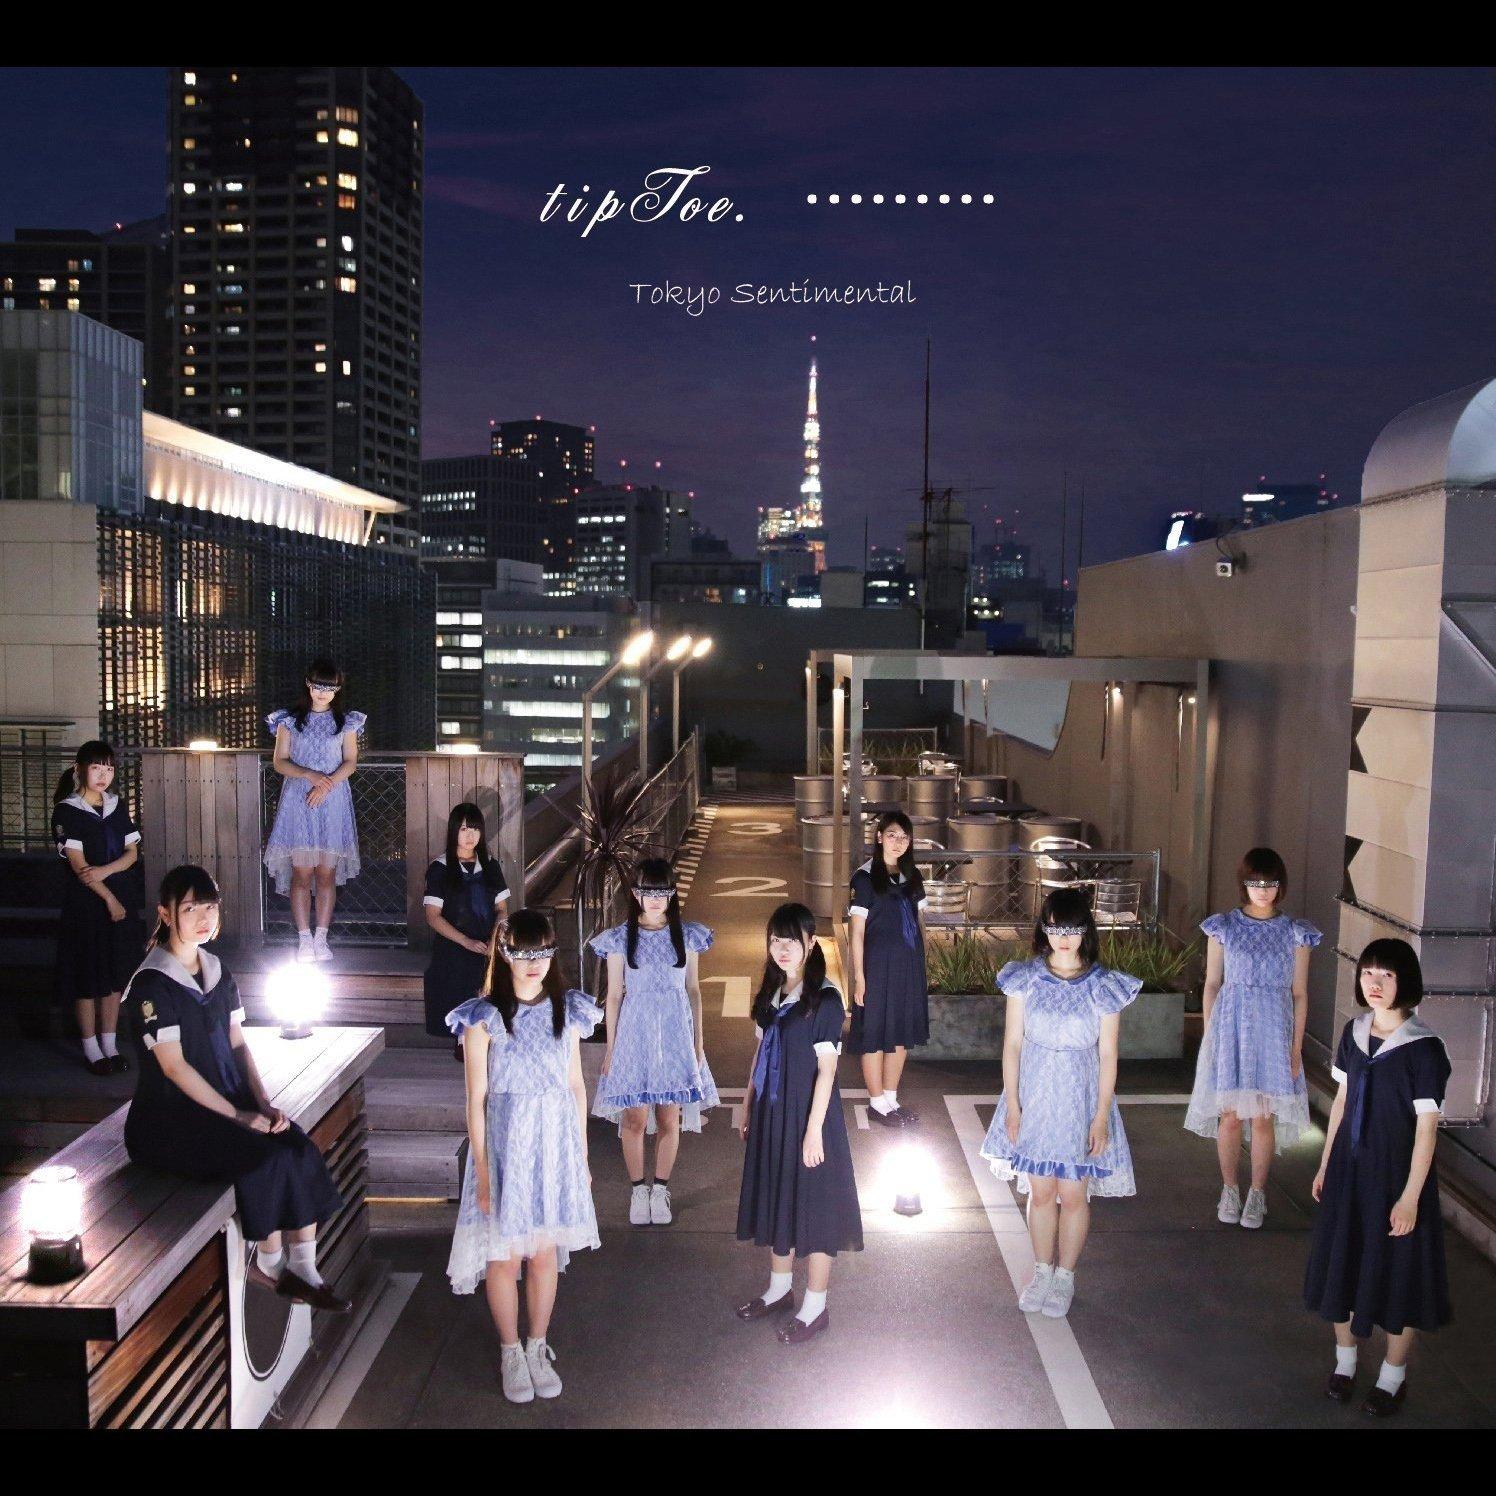 tipToe. x ......... - Tokyo Sentimental